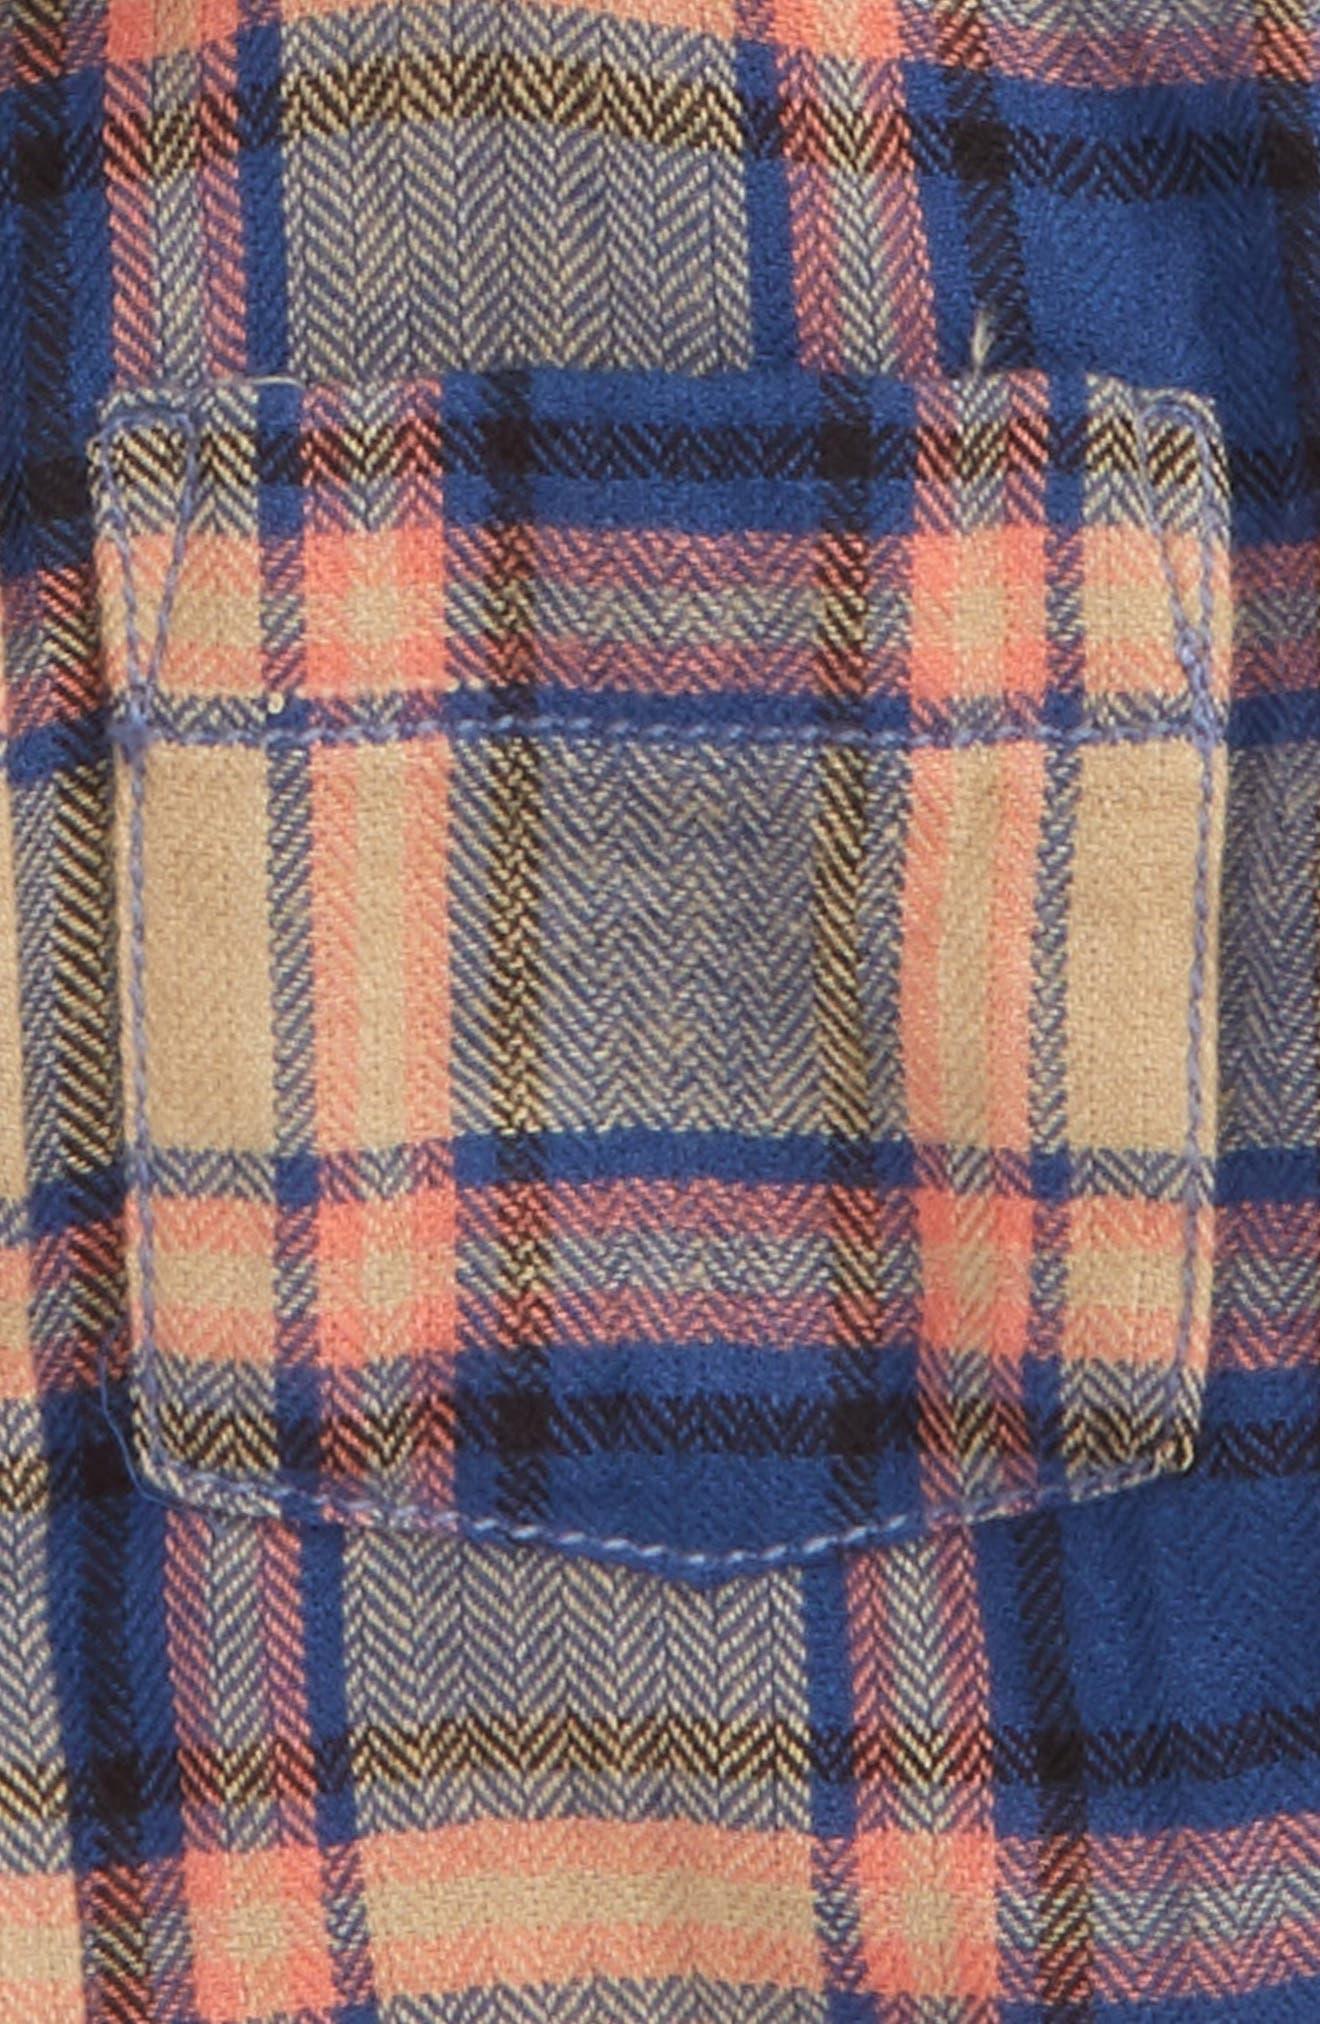 Henry Plaid Woven Shirt,                             Alternate thumbnail 3, color,